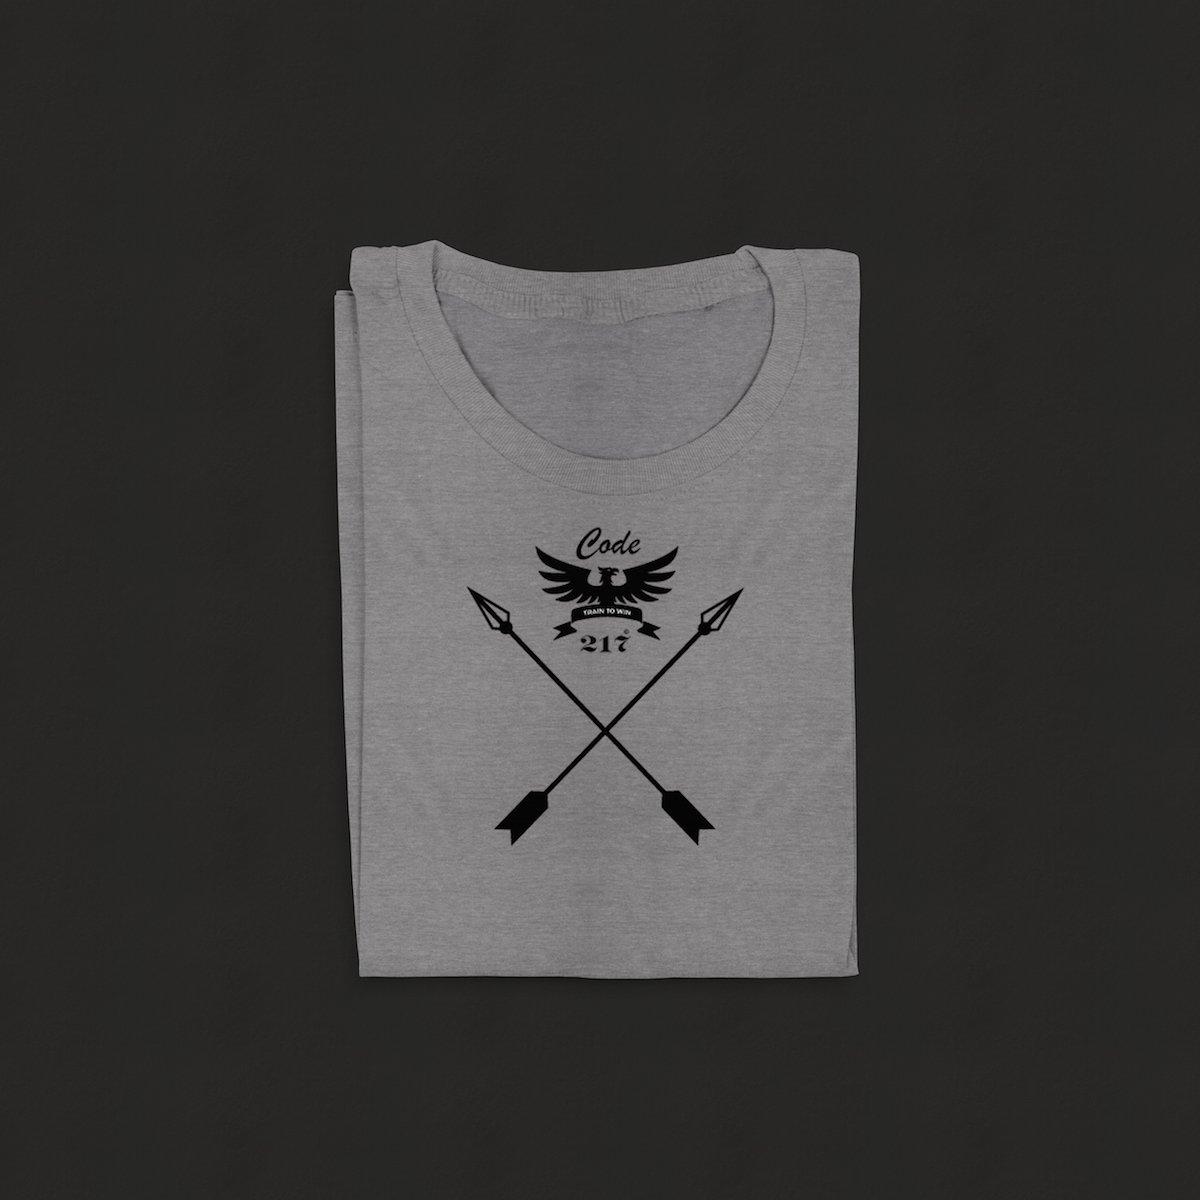 Image of 217 SFO T-shirt